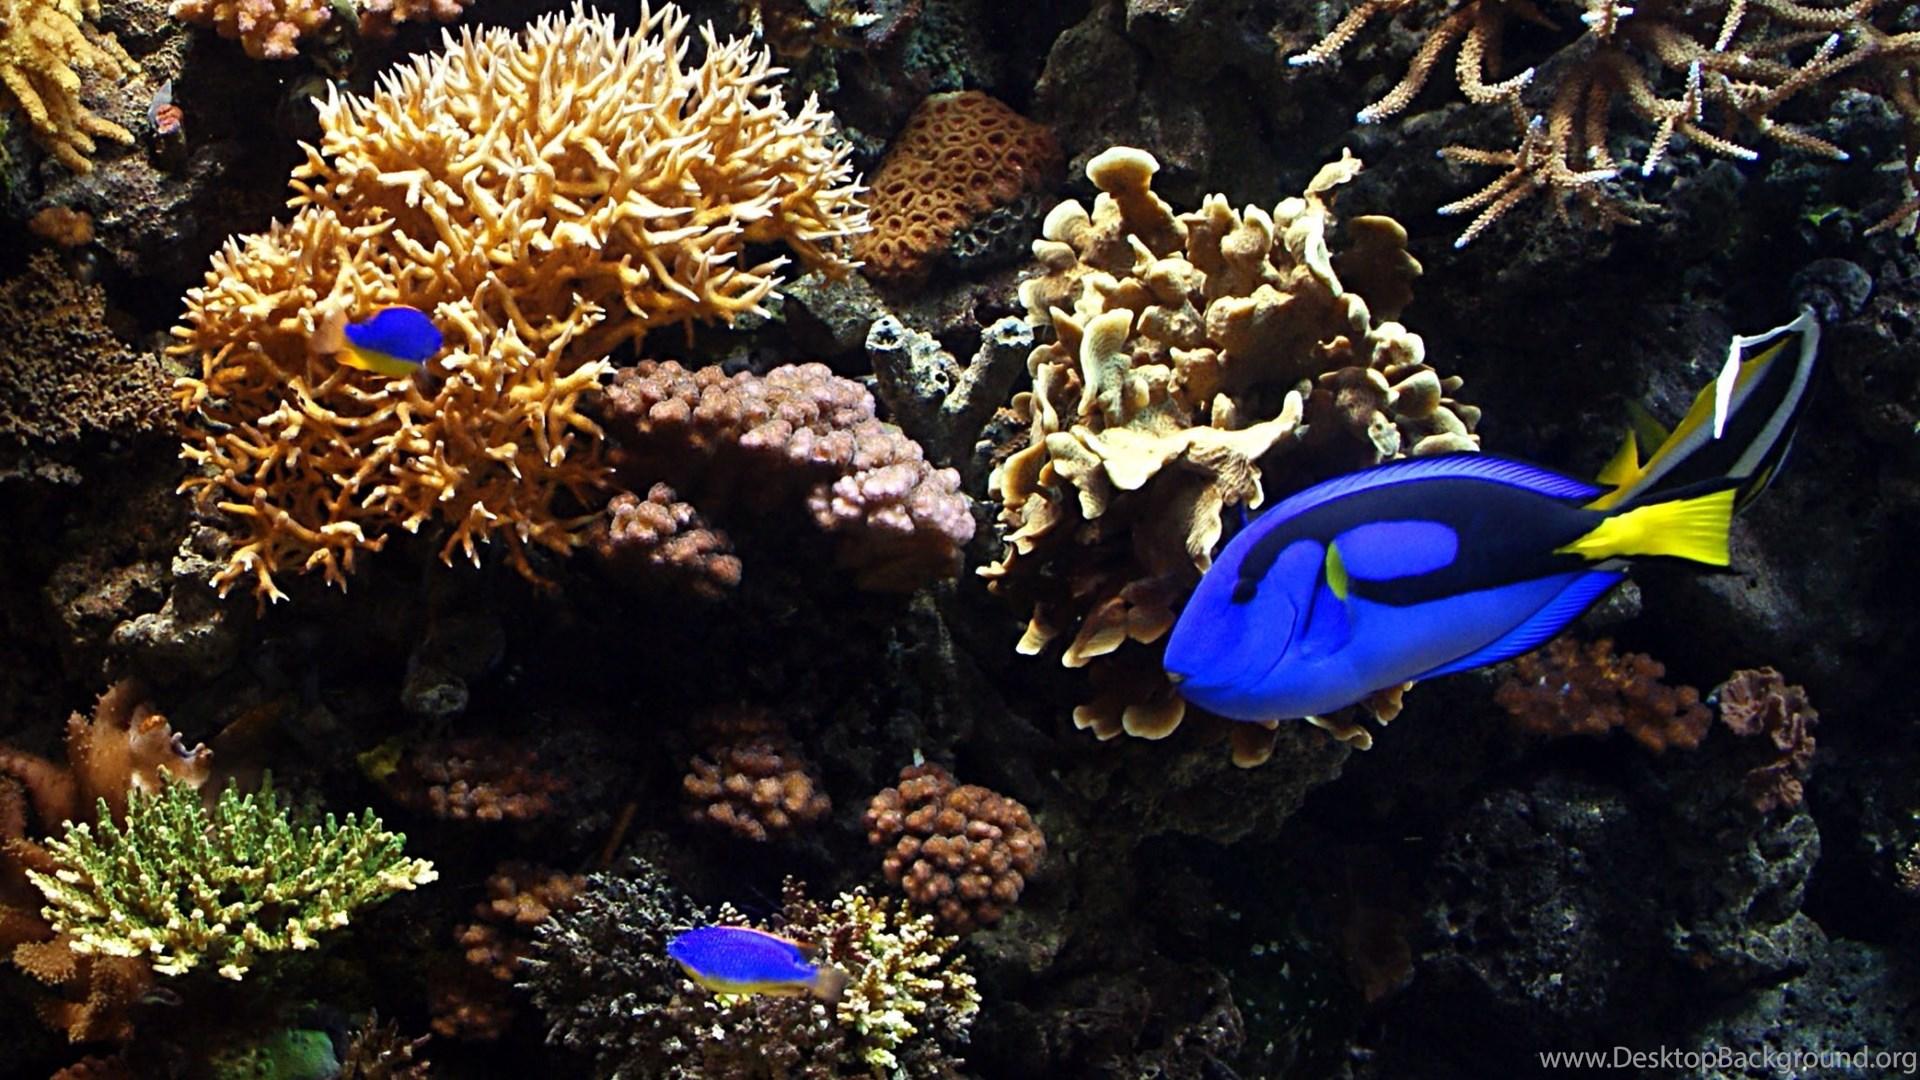 Aquarium Fish Hd Desktop Wallpapers Widescreen High Definition